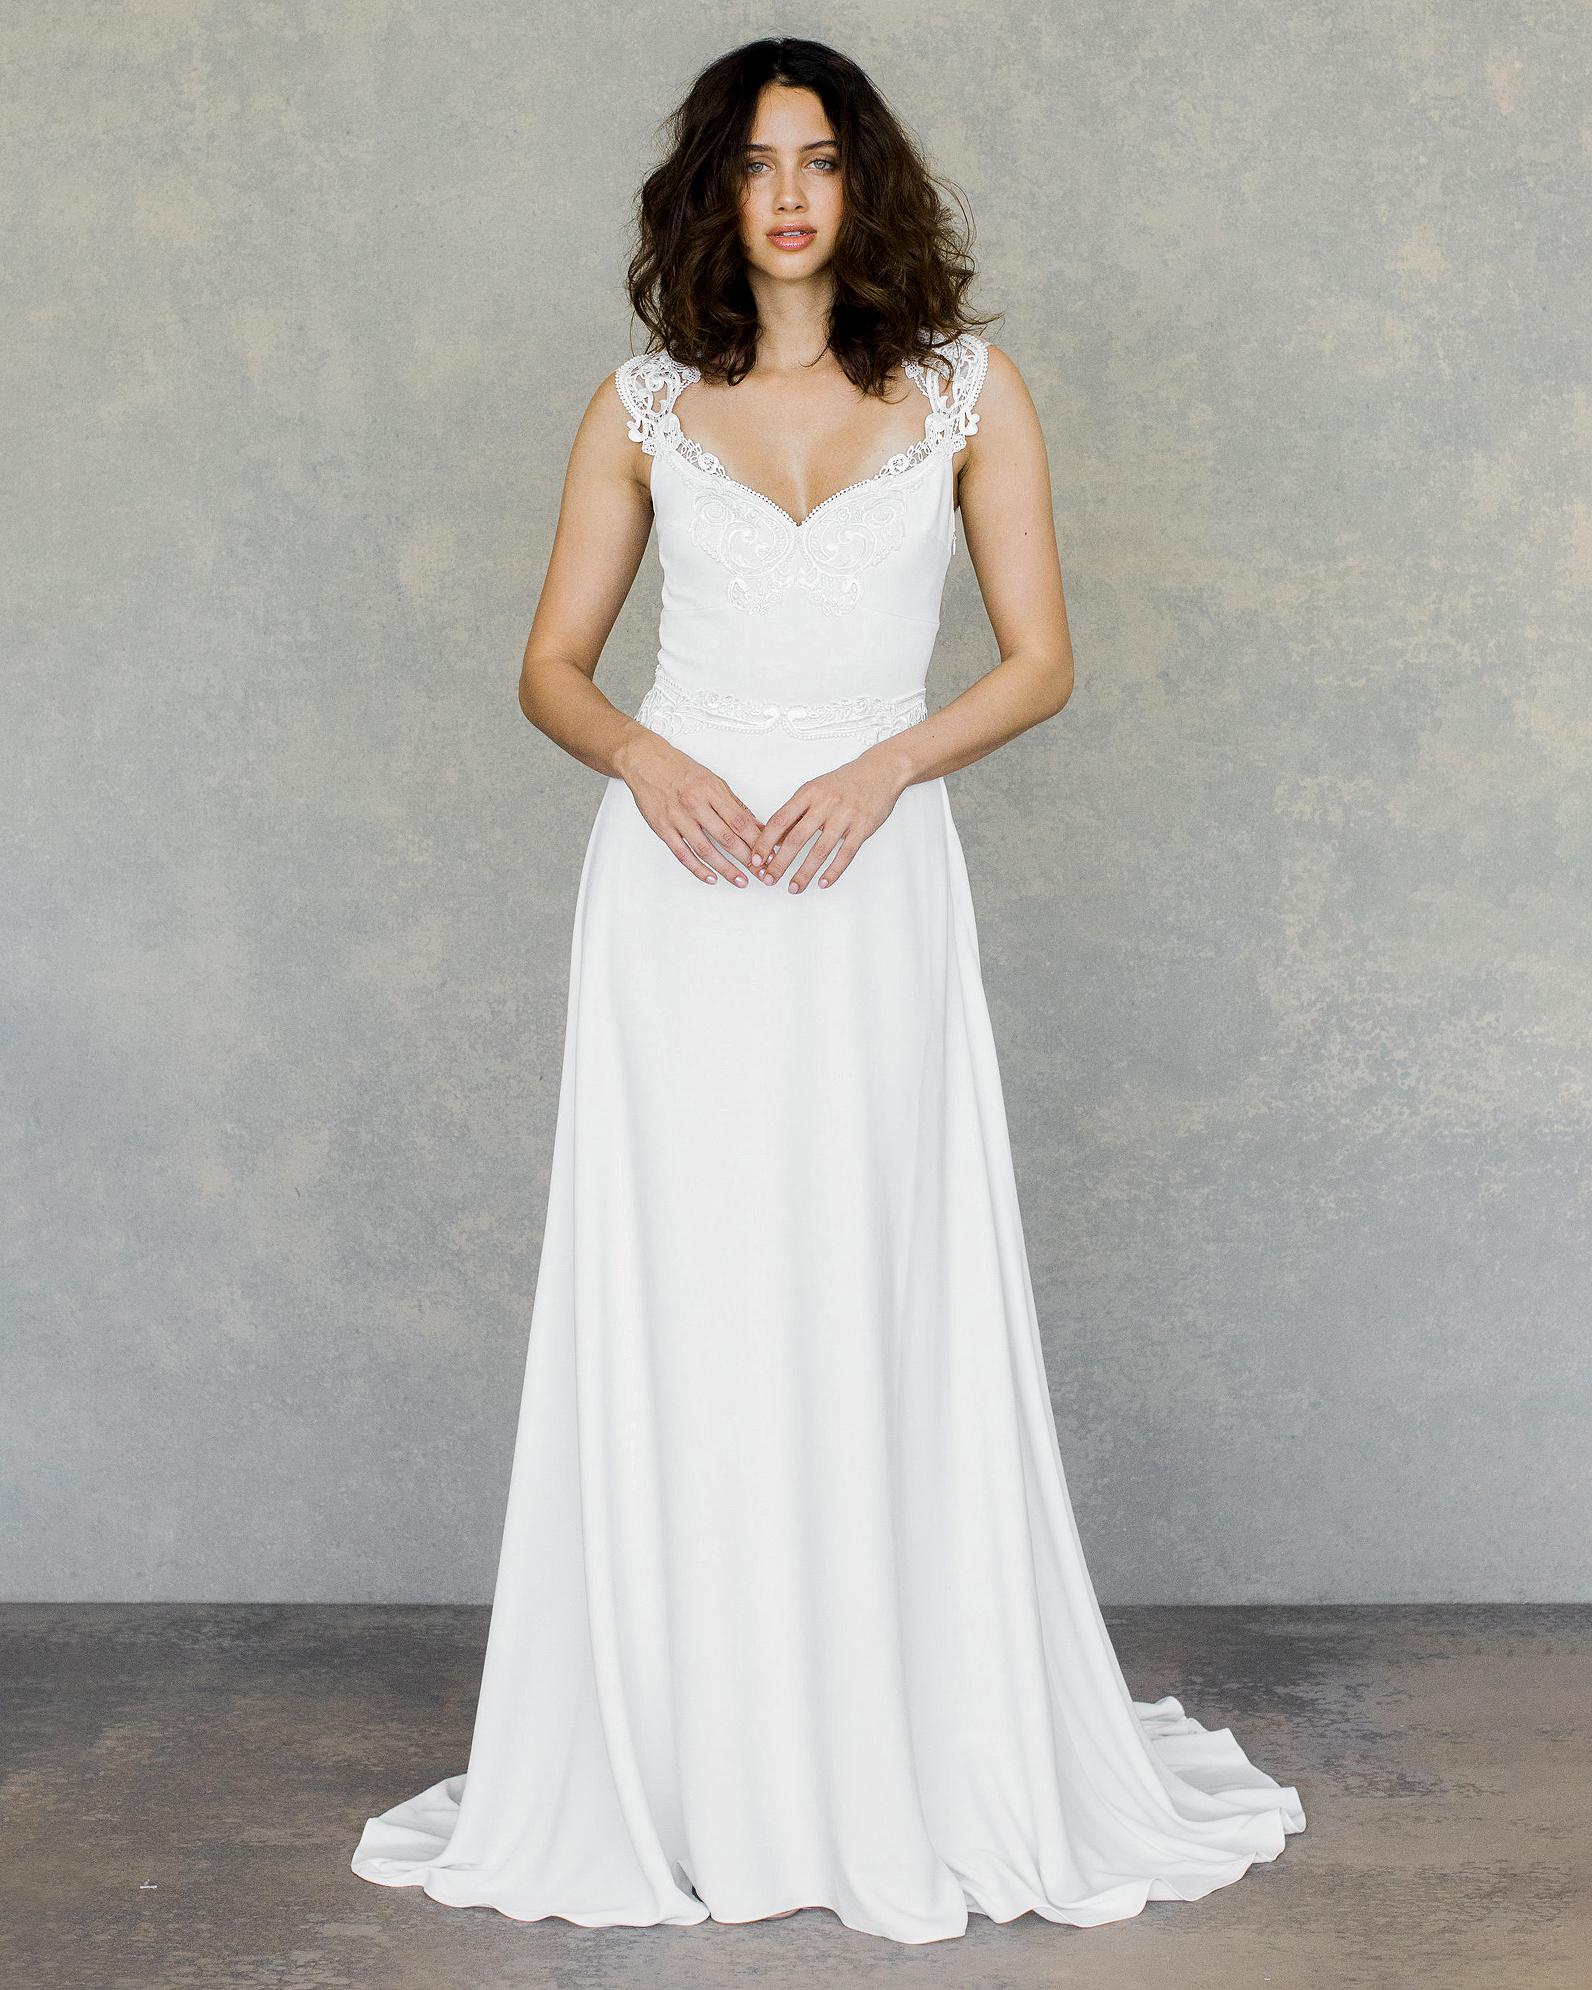 claire pettibone wedding dress spring 2019 v-neck lace shoulder details